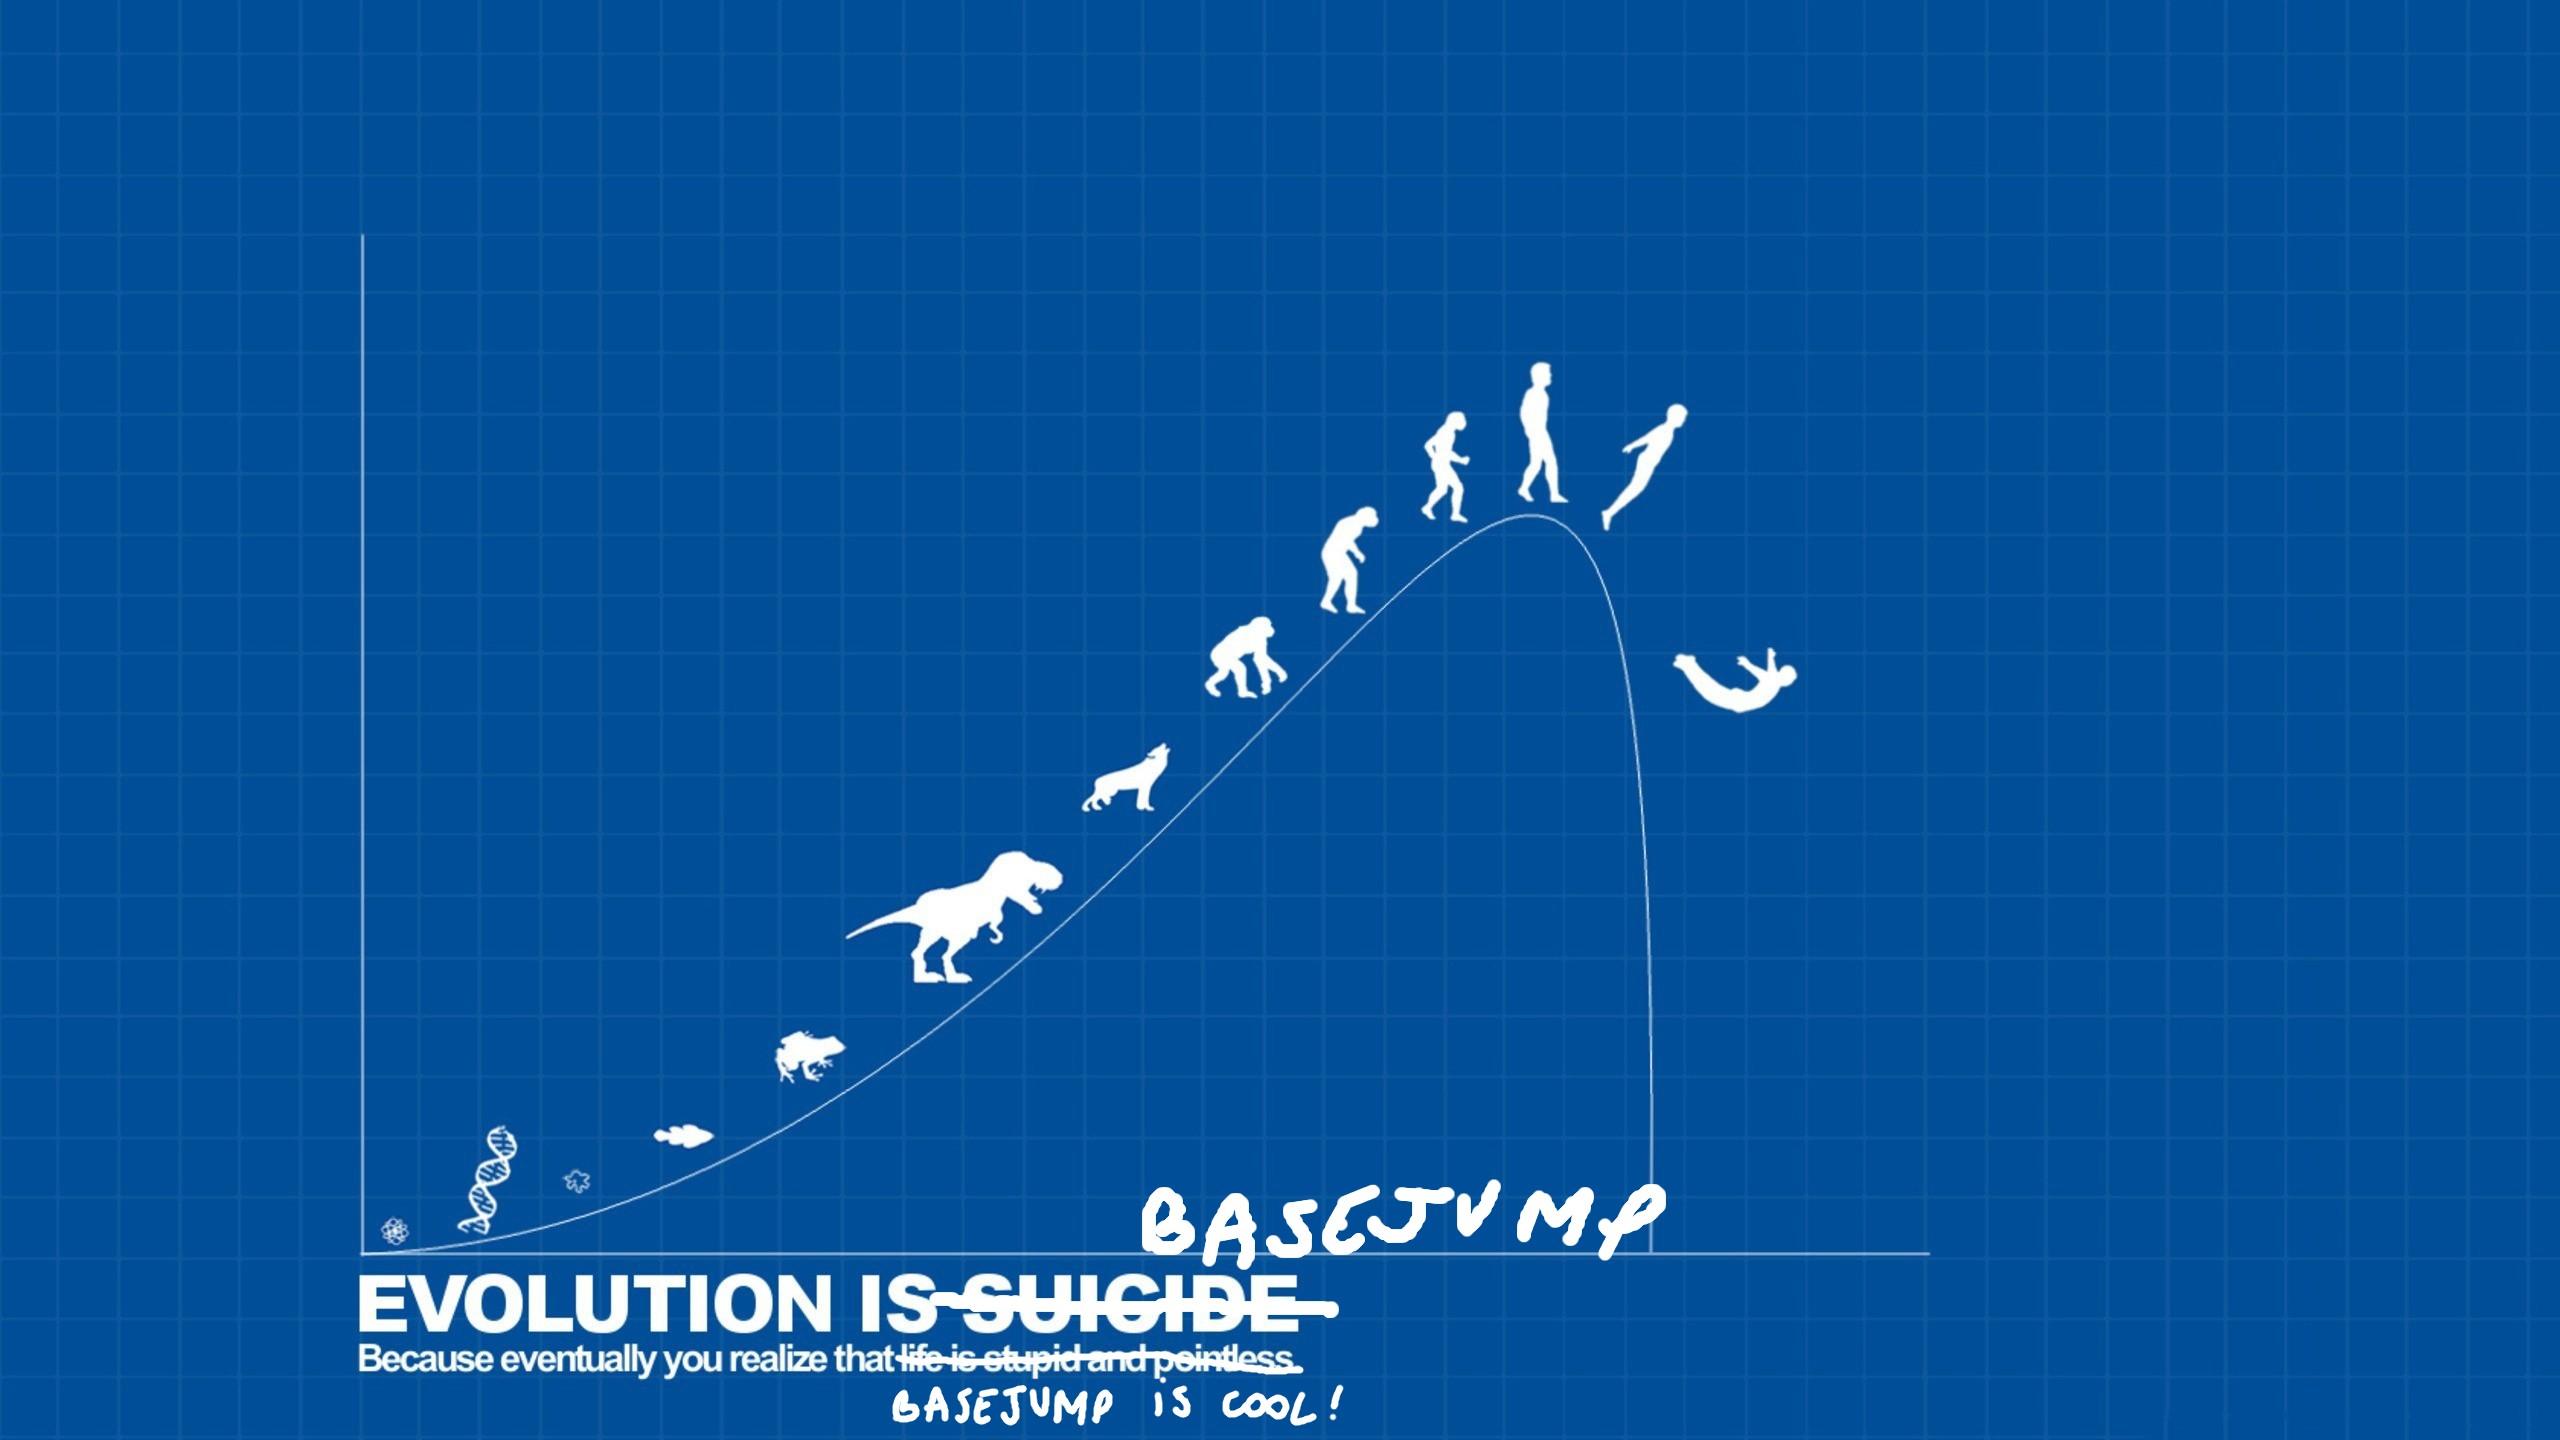 BASE Jumping evolution suicide